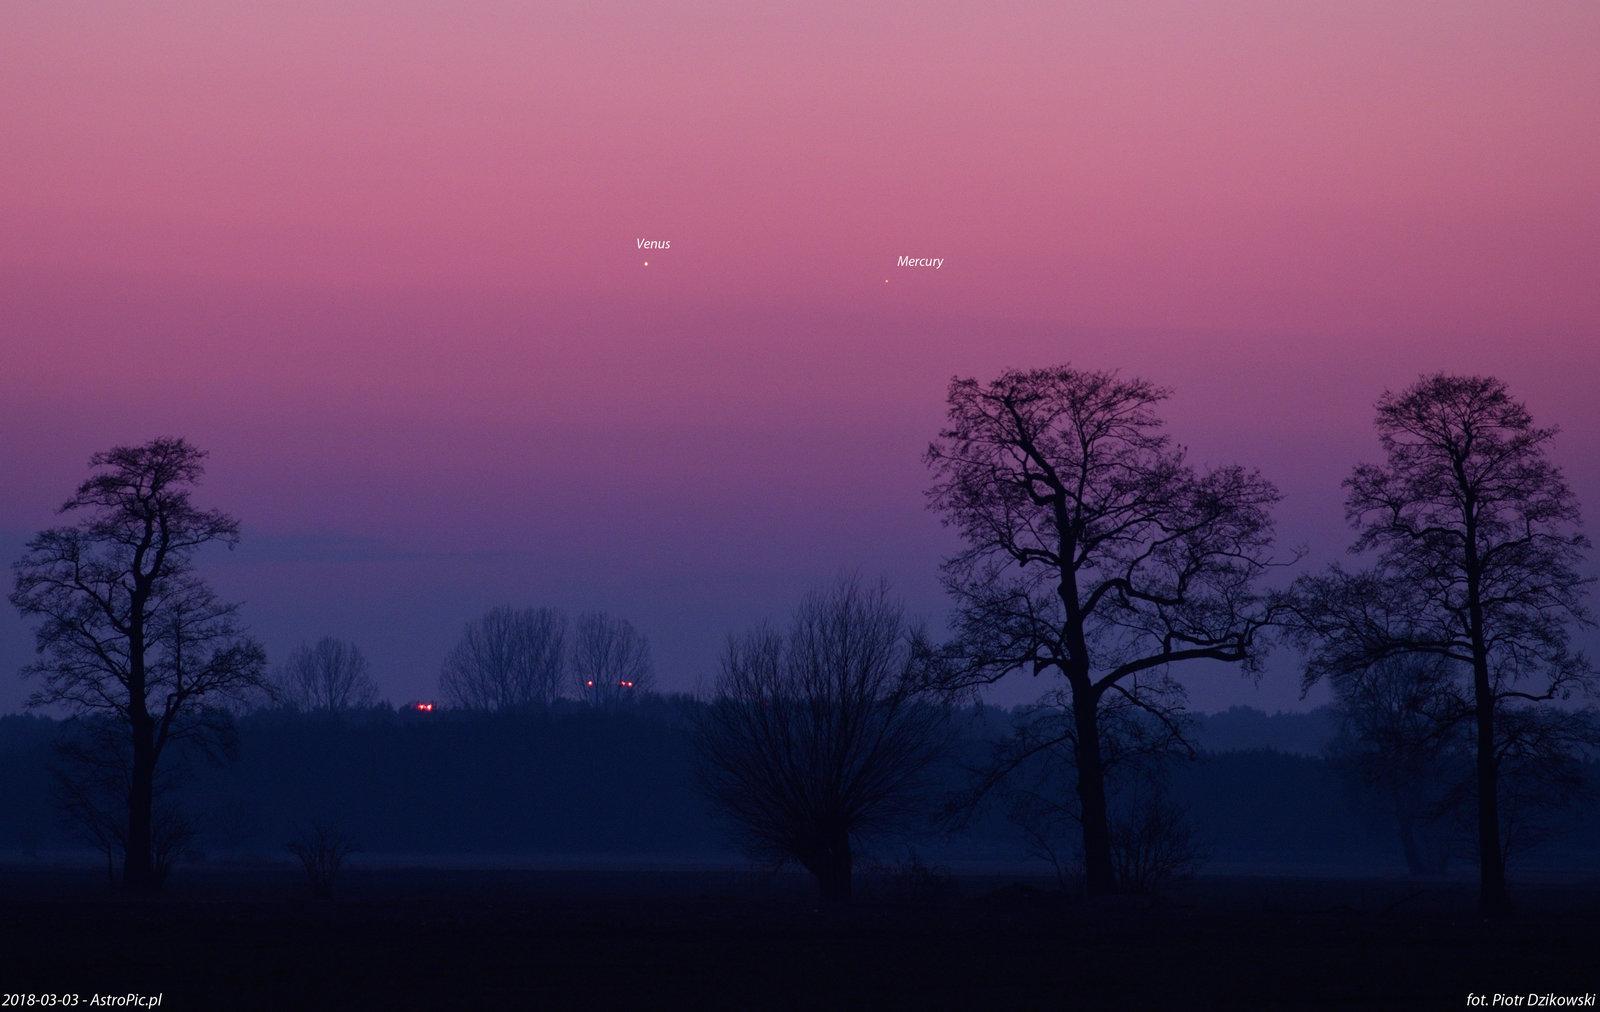 Venus_Mercury.thumb.jpg.f1765ac08c3a42faeb1e60f04200677d.jpg